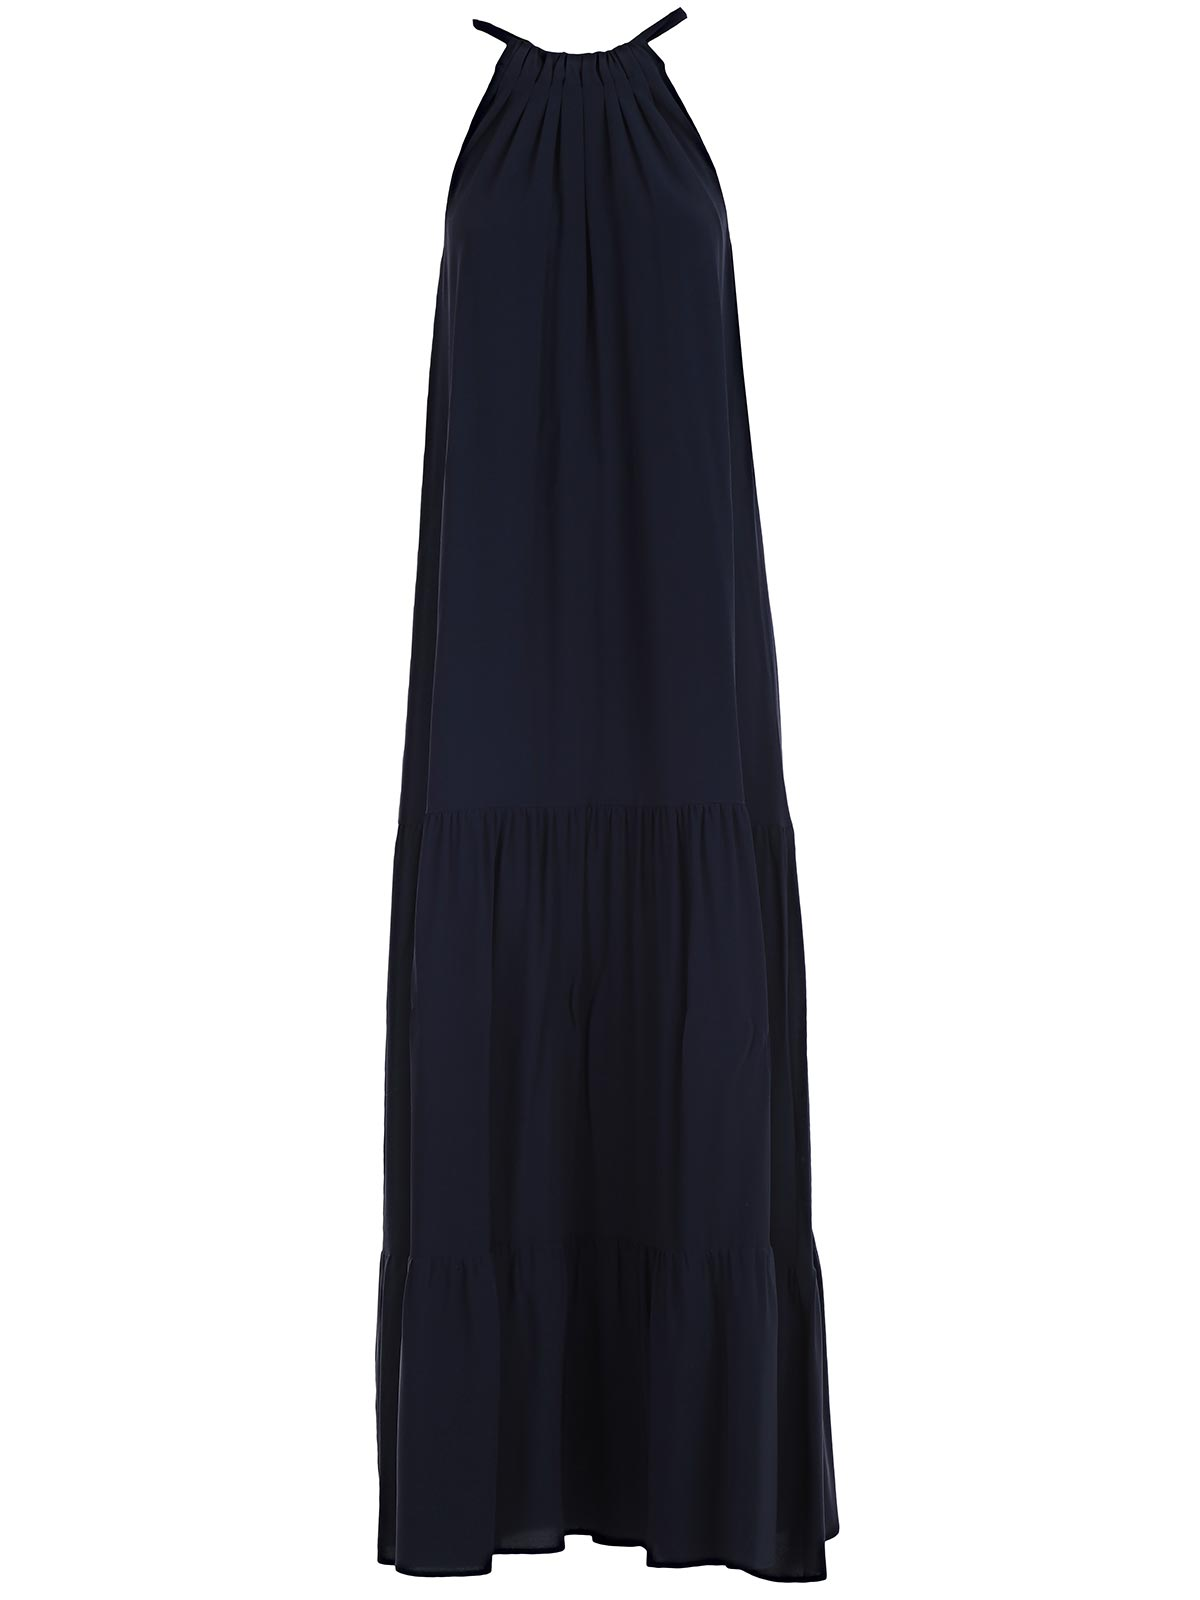 Picture of Erika Cavallini Dress